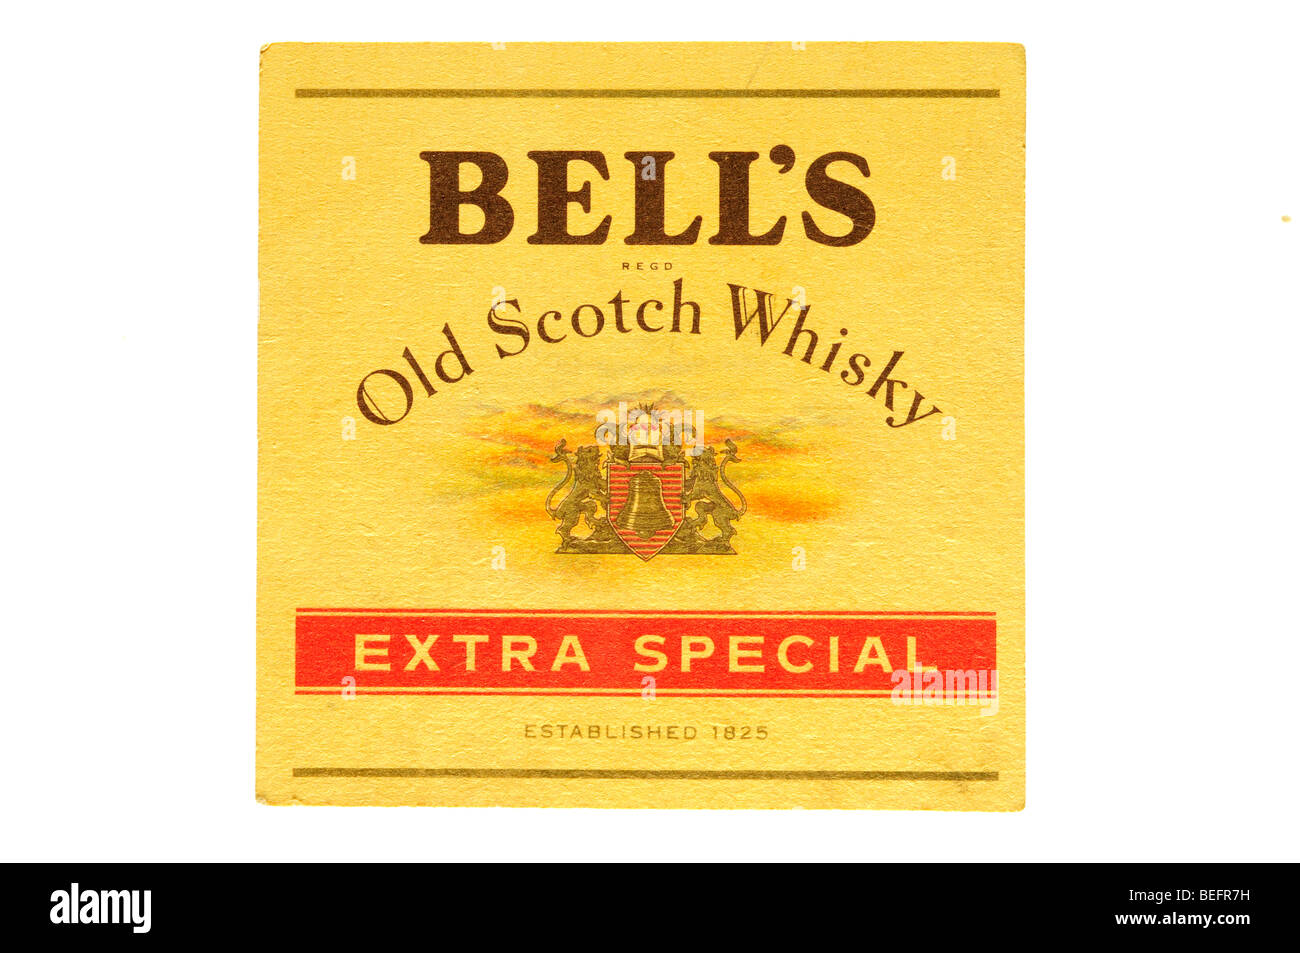 Bells Old Scotch Whisky Extra Special Established 1825